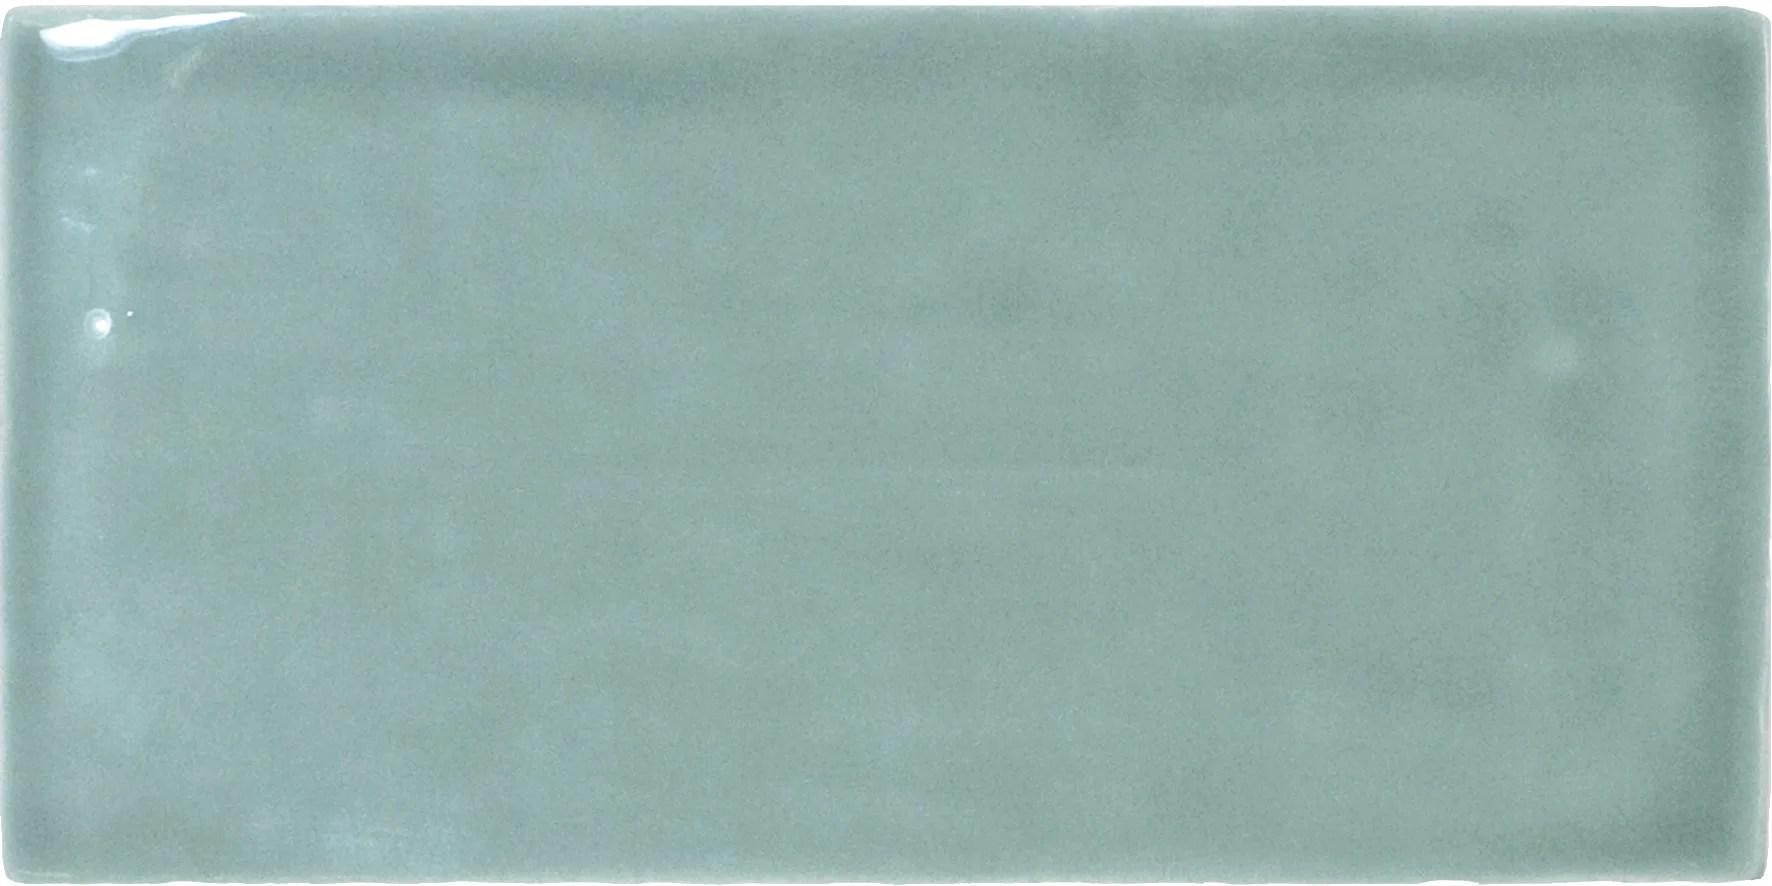 carrelage mur forte uni vert emaille l 7 5 x l 15 cm bakerstreet